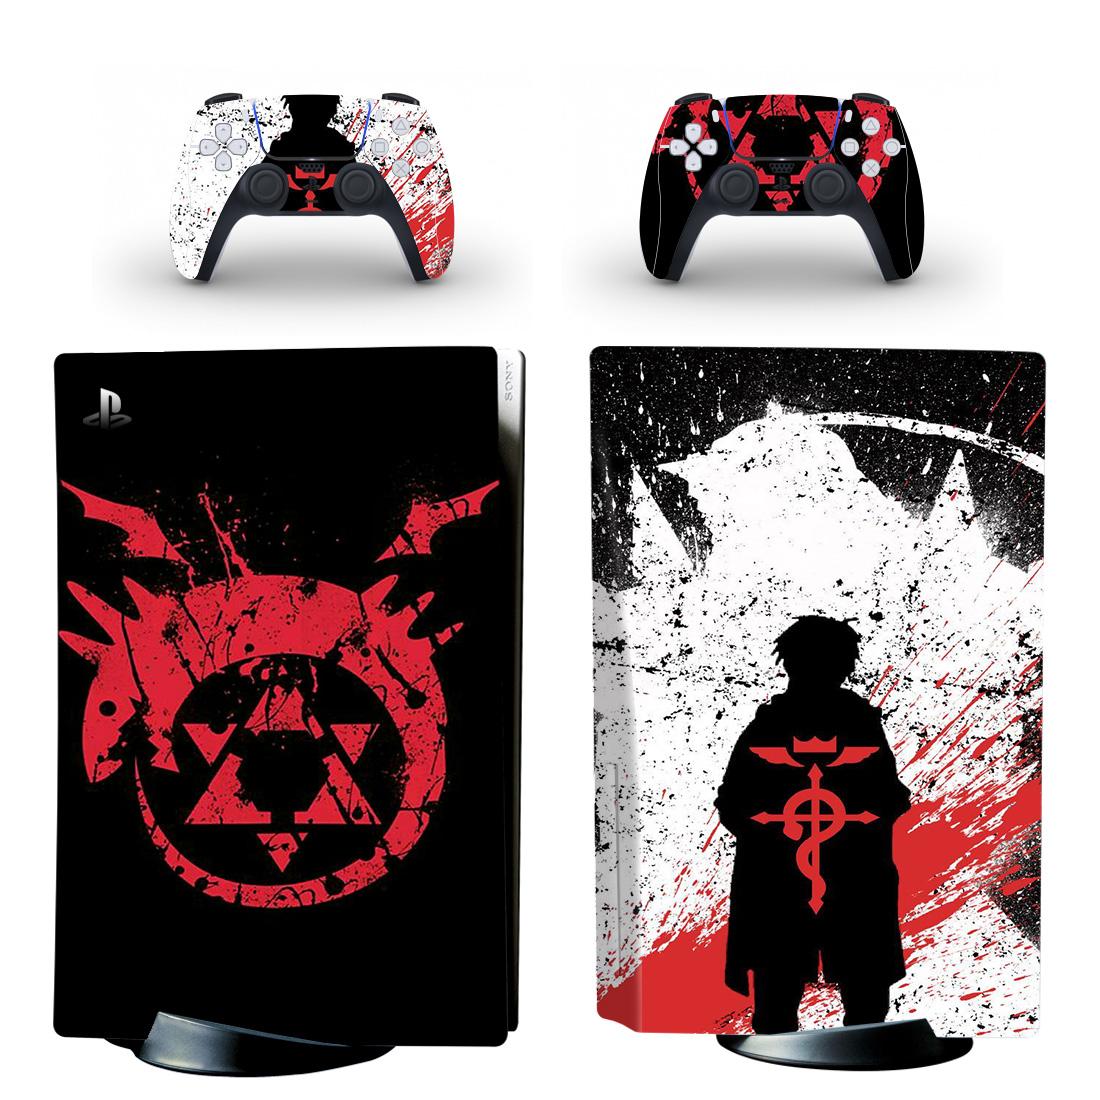 Fullmetal Alchemist PS5 Skin Sticker Decal